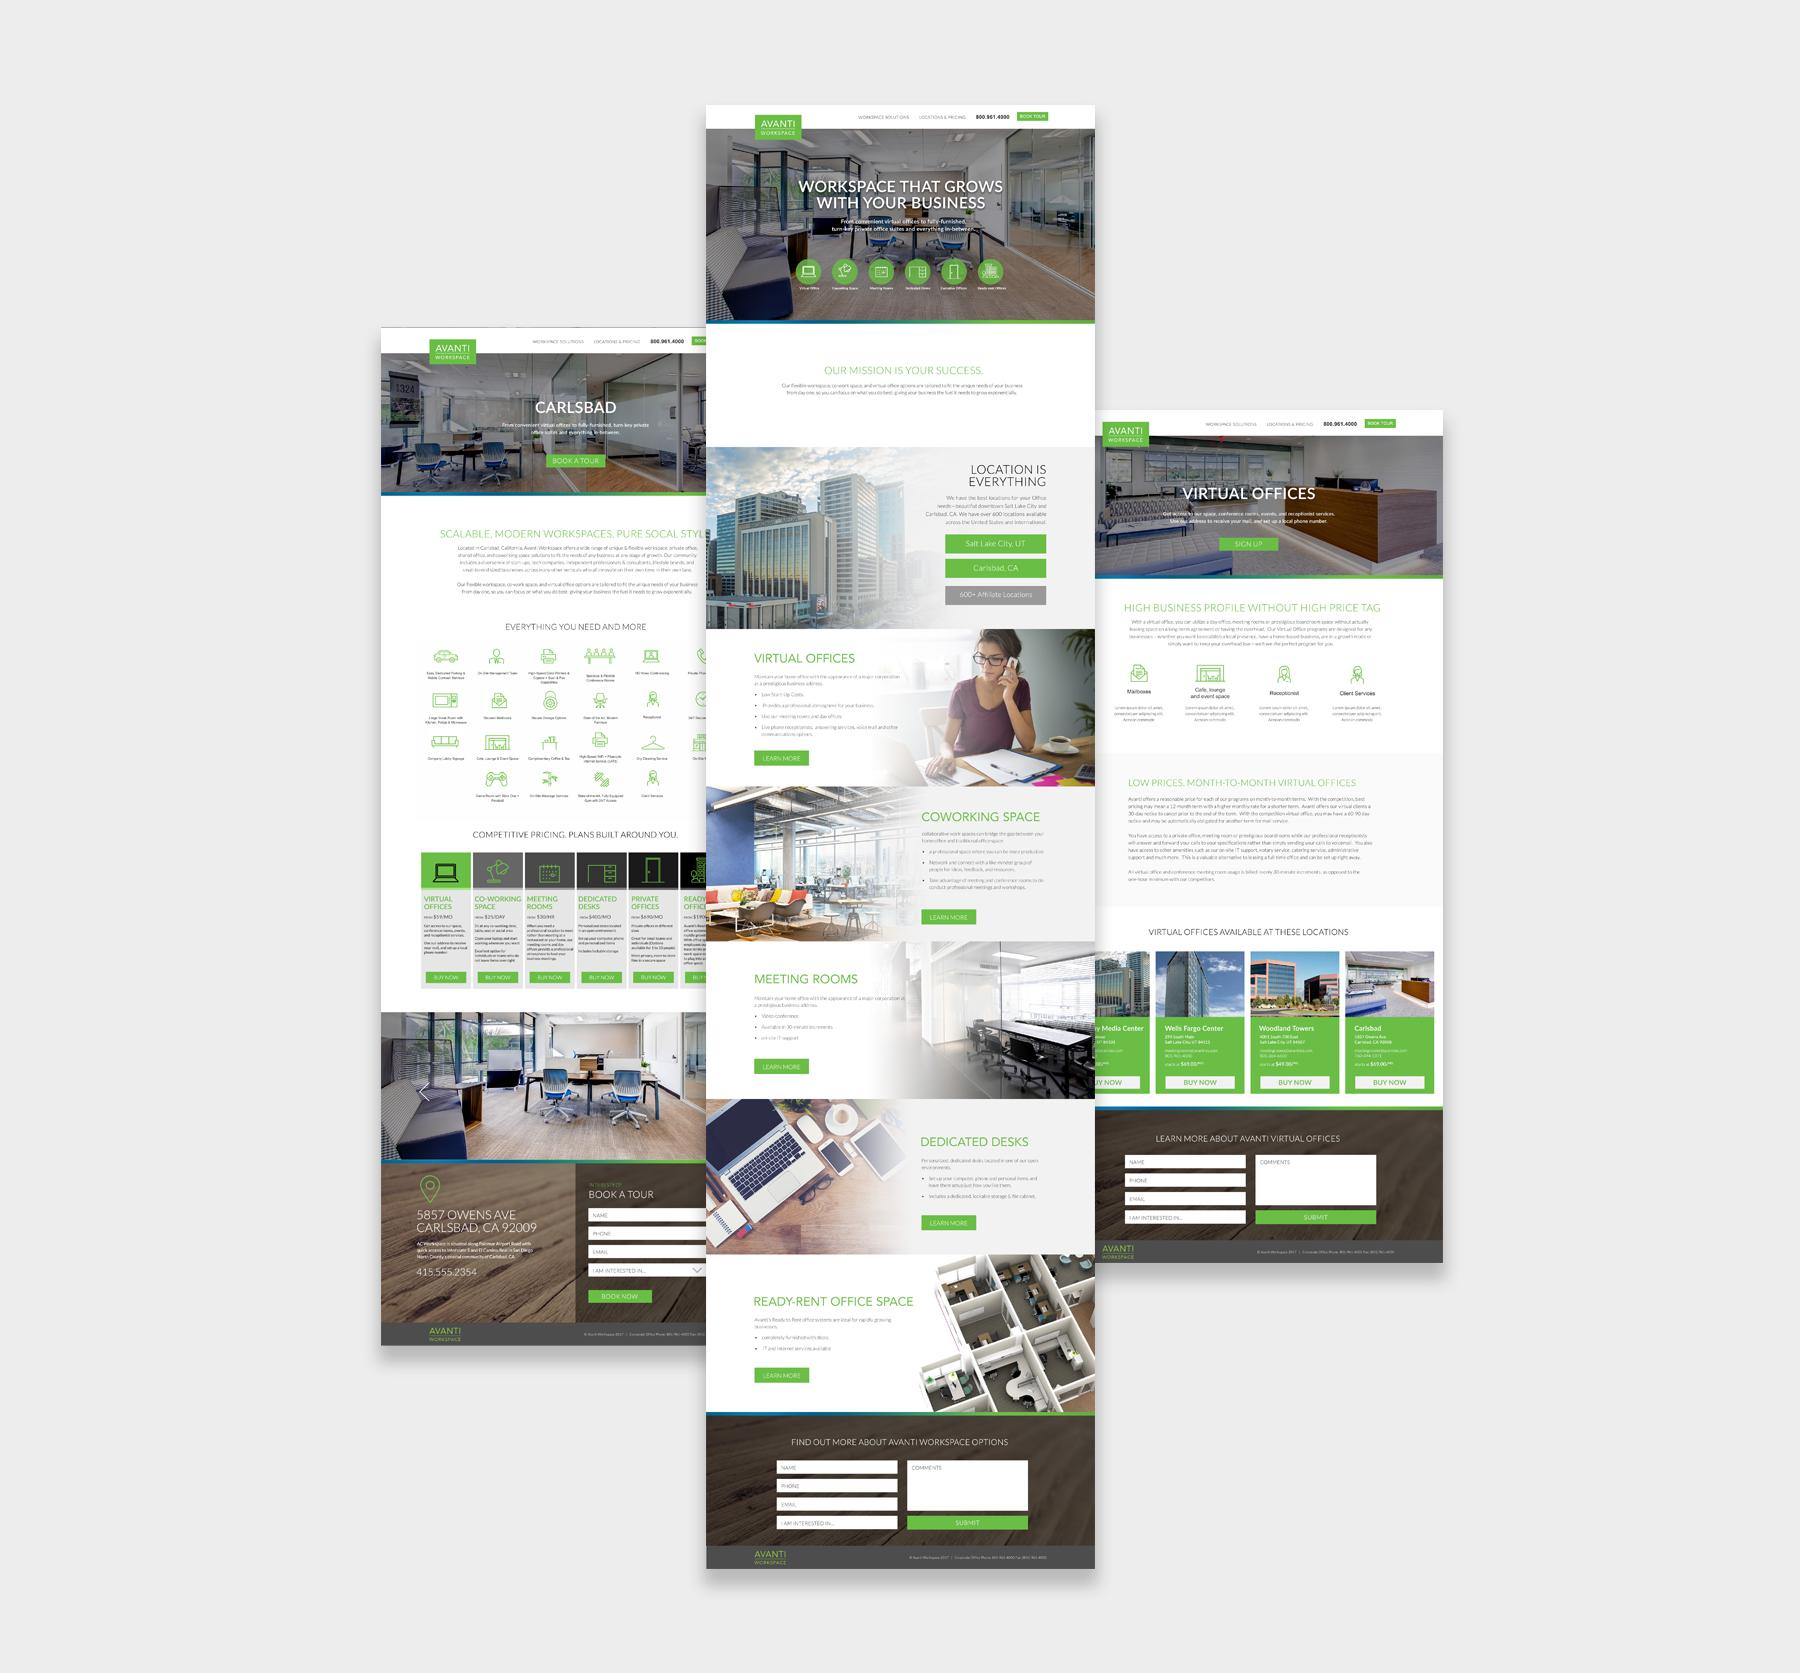 Avanti Workspace website screenshots